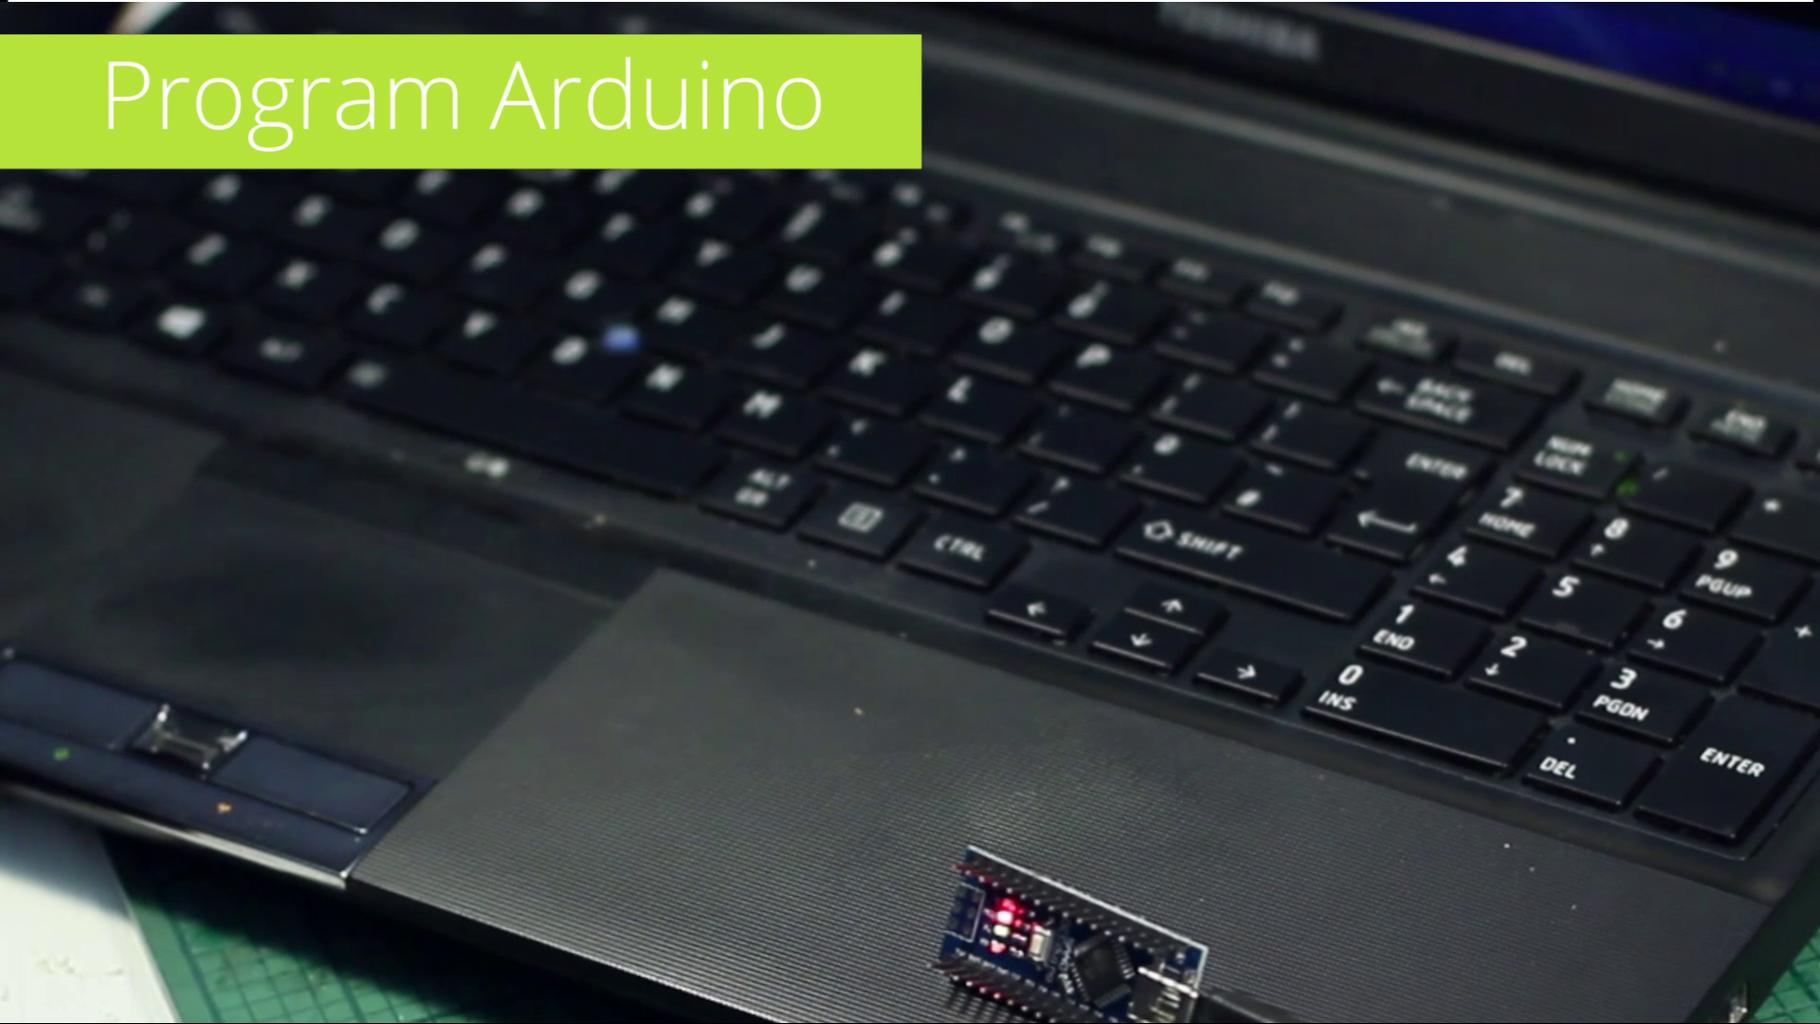 Program Arduino